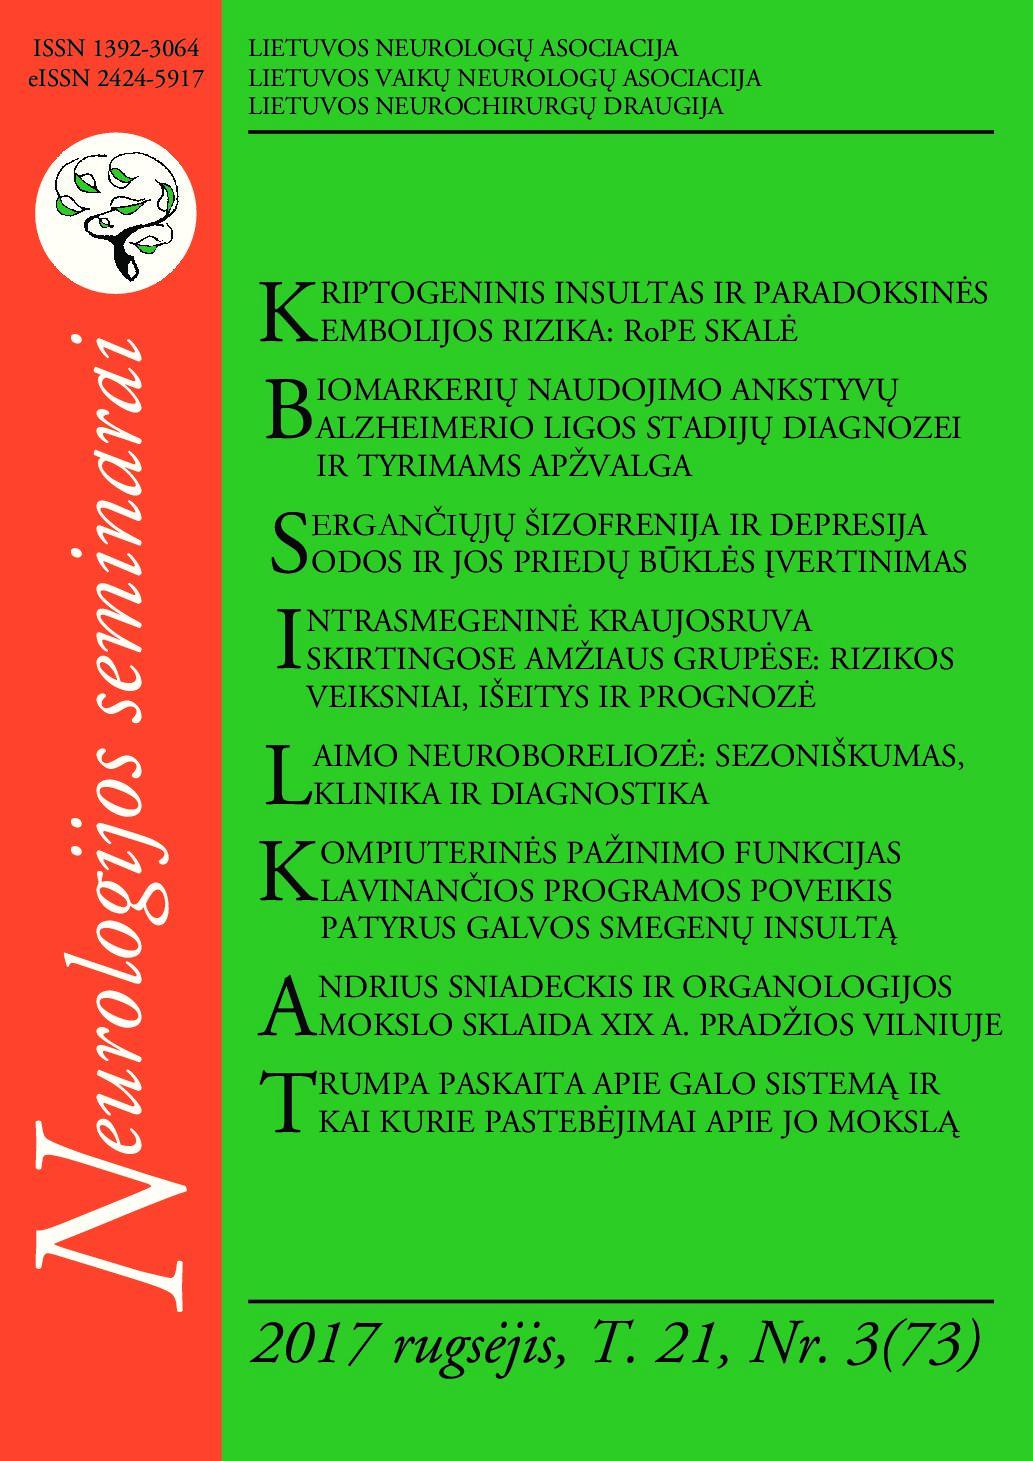 hipertenzijos ligos charakteristikos